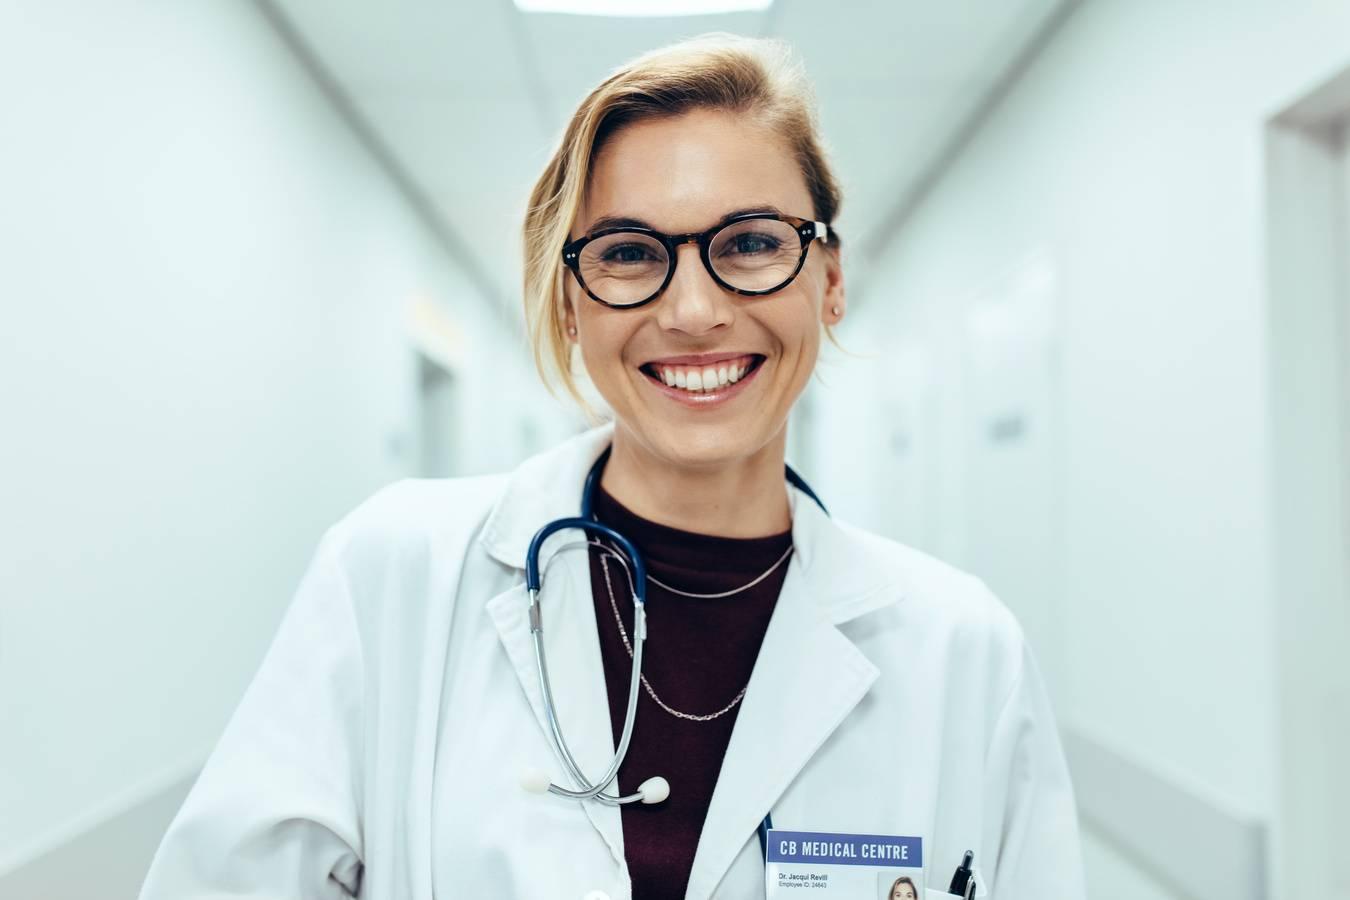 Stationsleiter - Kranken- / Alten- / Kinderkrankenpflege